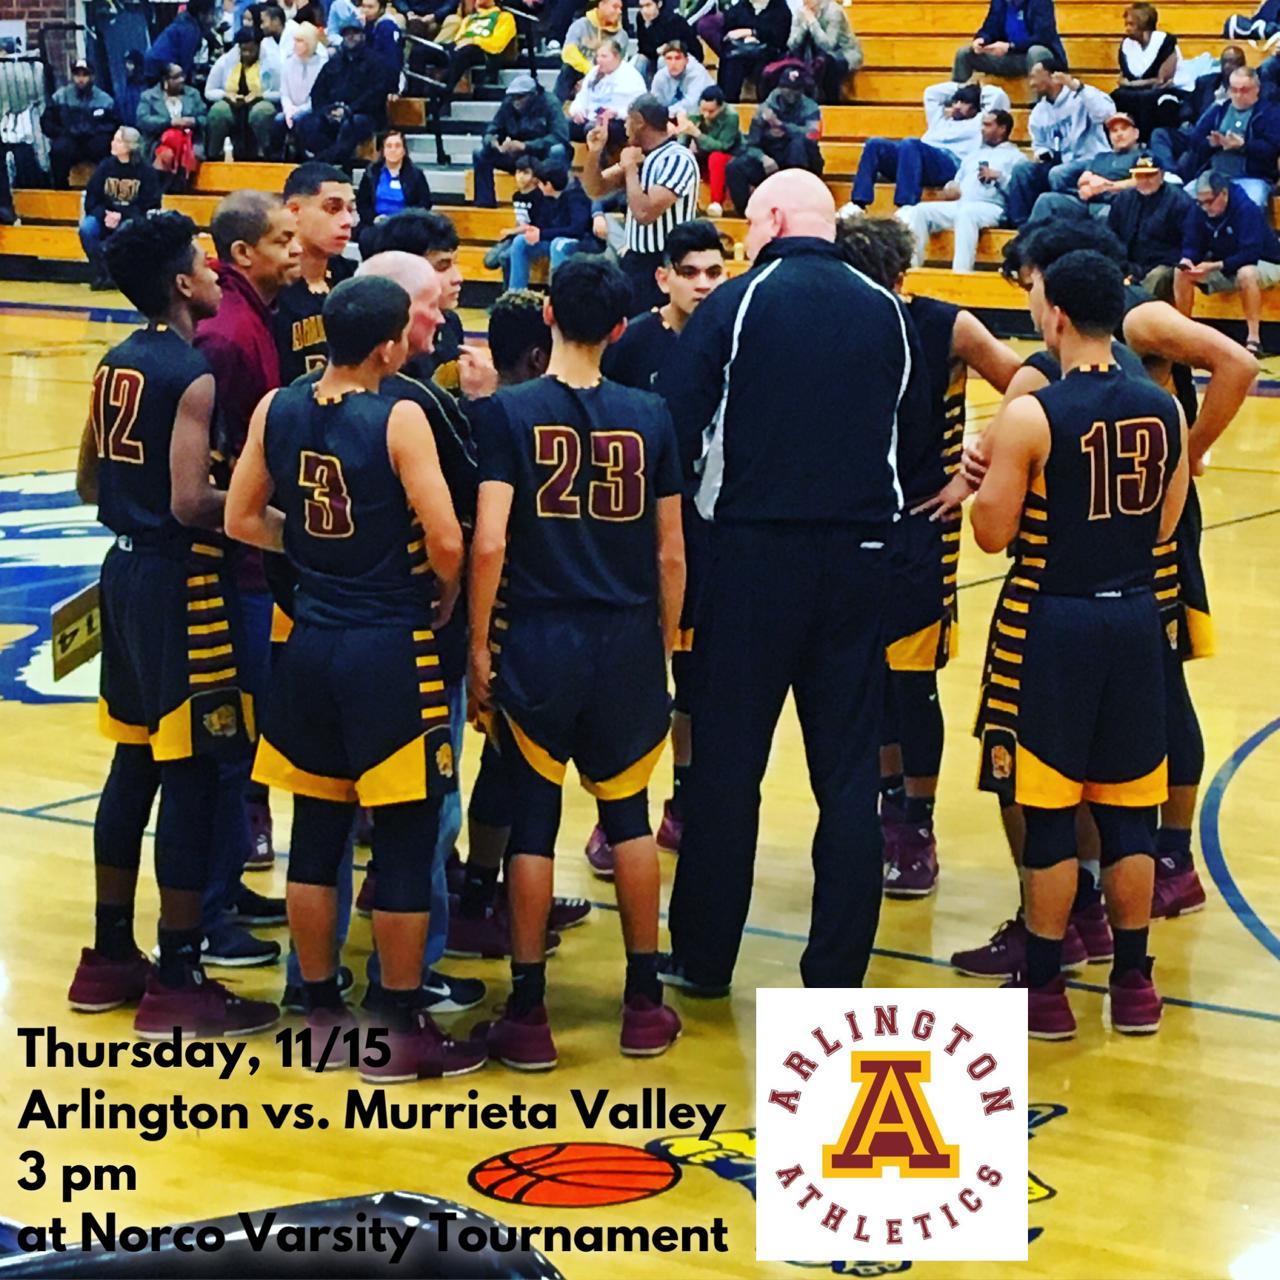 Thursday, 11/15: Arlington Boys' Varsity Basketball vs. Murrieta Valley at Norco Tournament – 3 p.m.